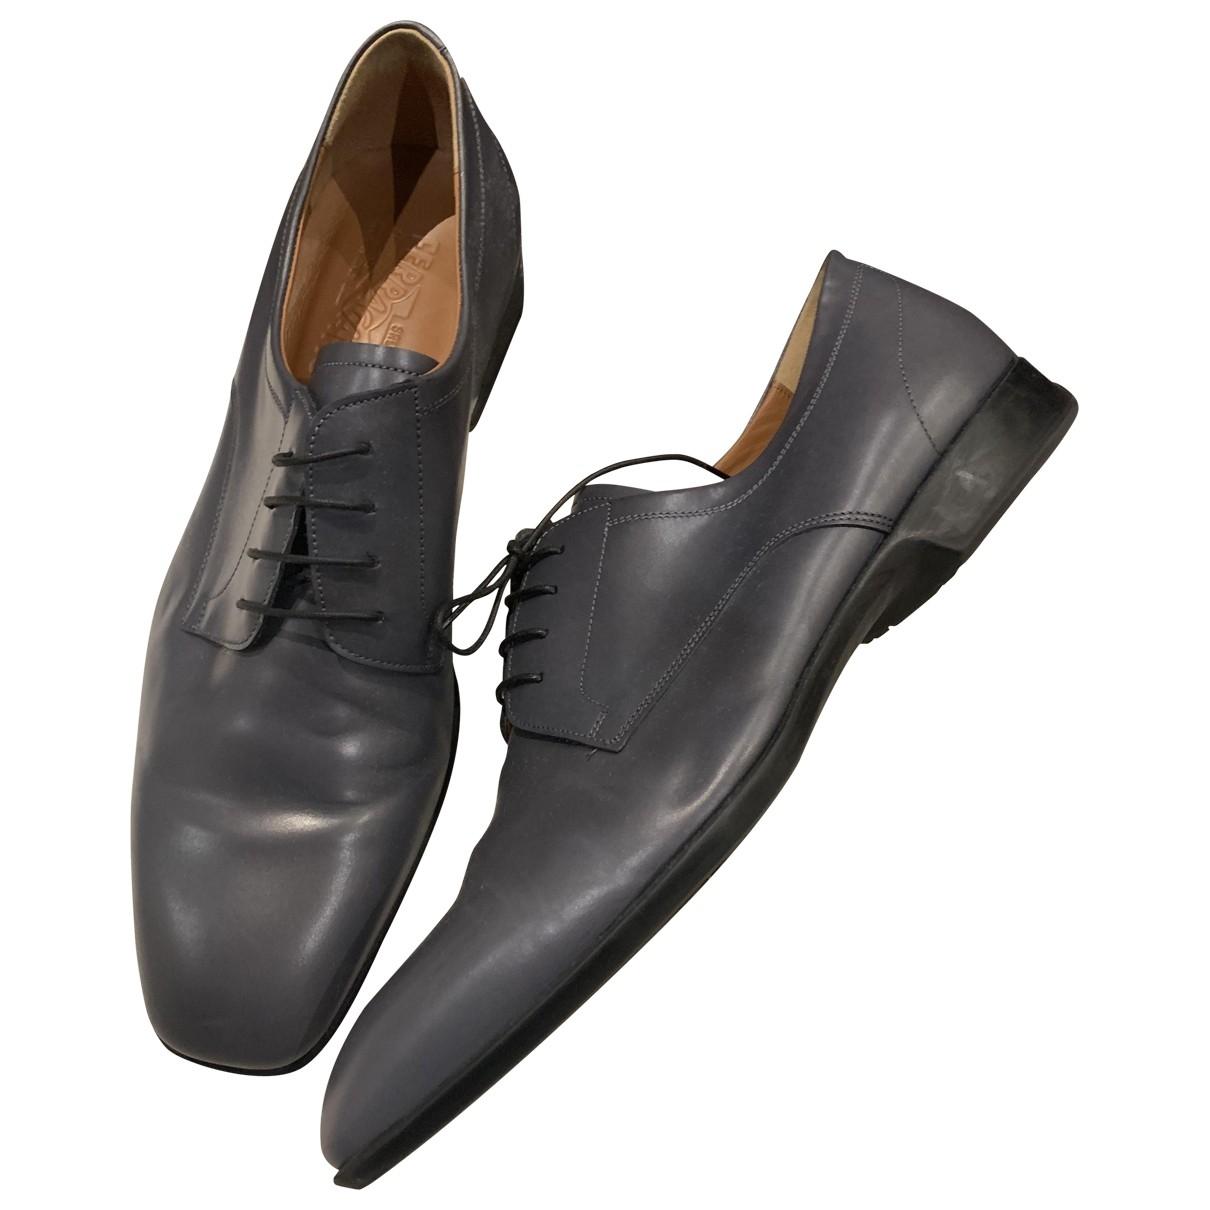 Salvatore Ferragamo \N Grey Leather Lace ups for Men 9.5 UK